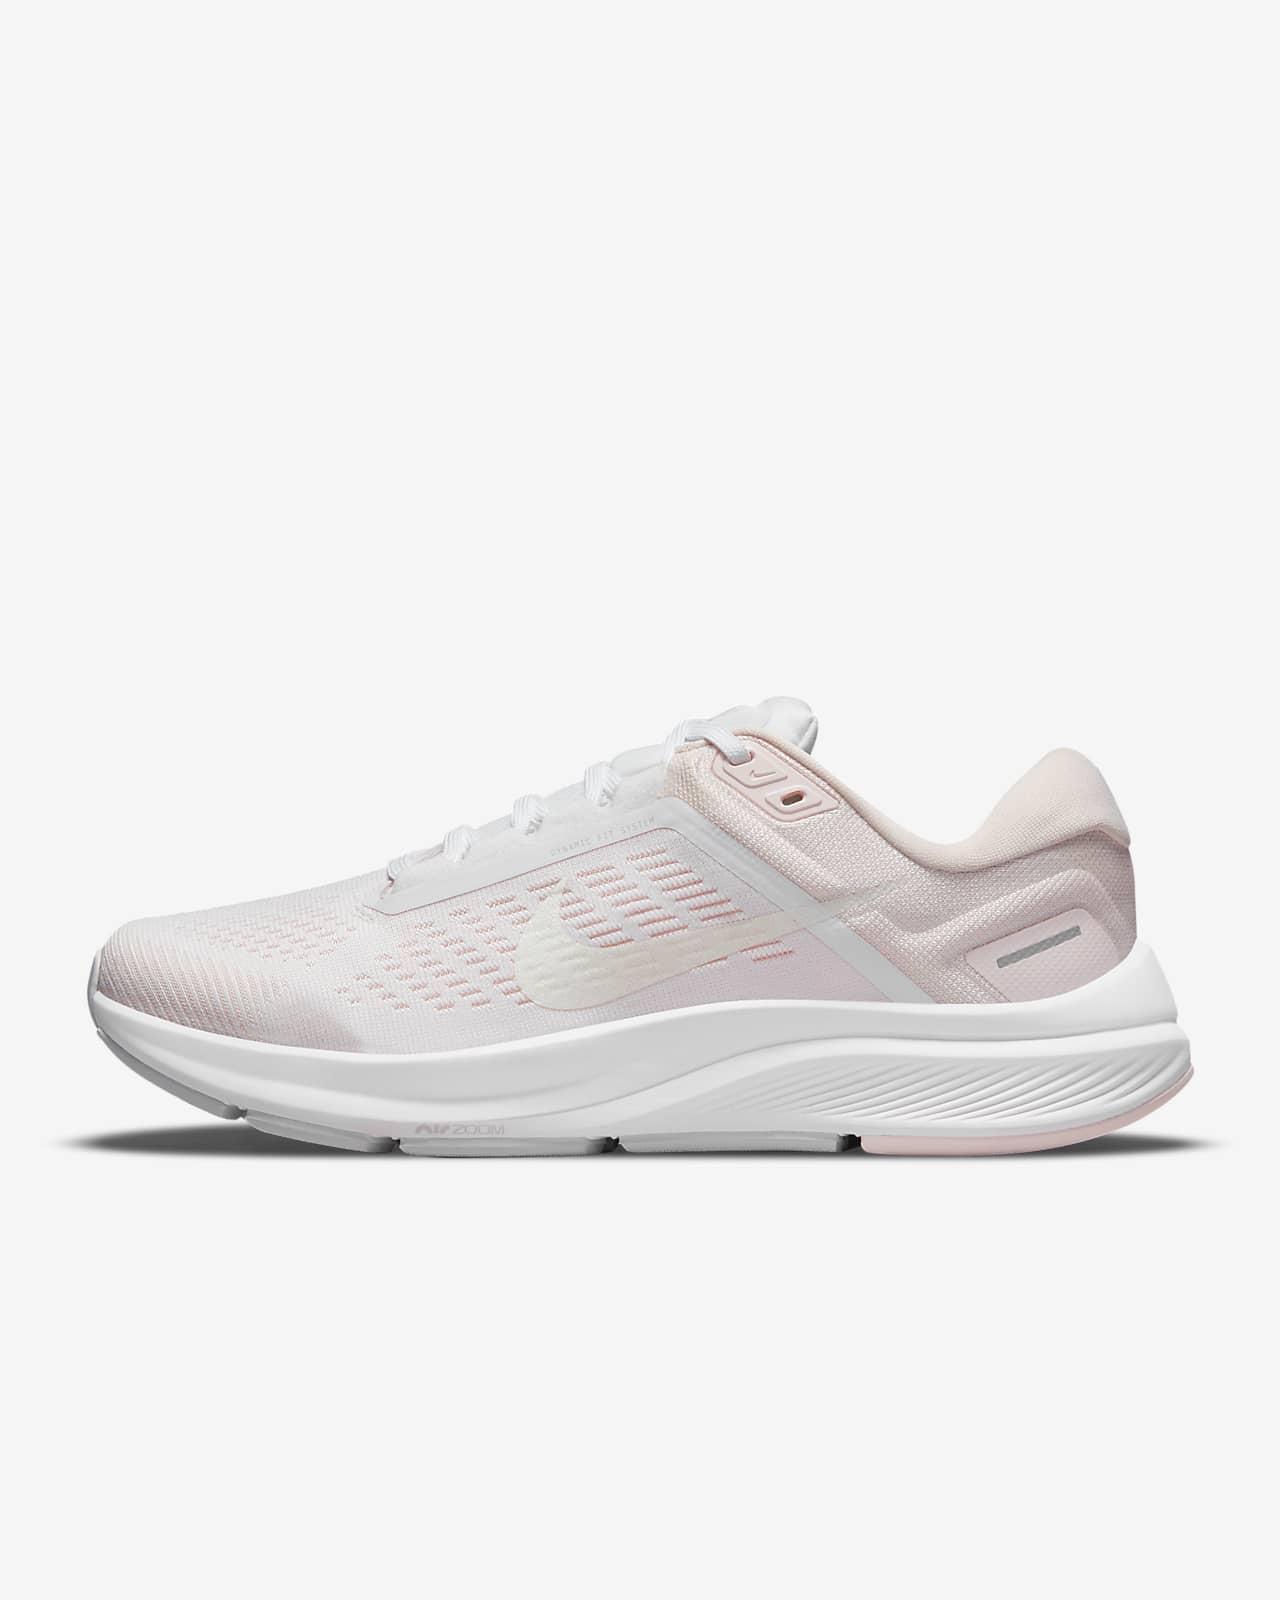 Chaussures de running sur route Nike Air Zoom Structure 24 pour Femme